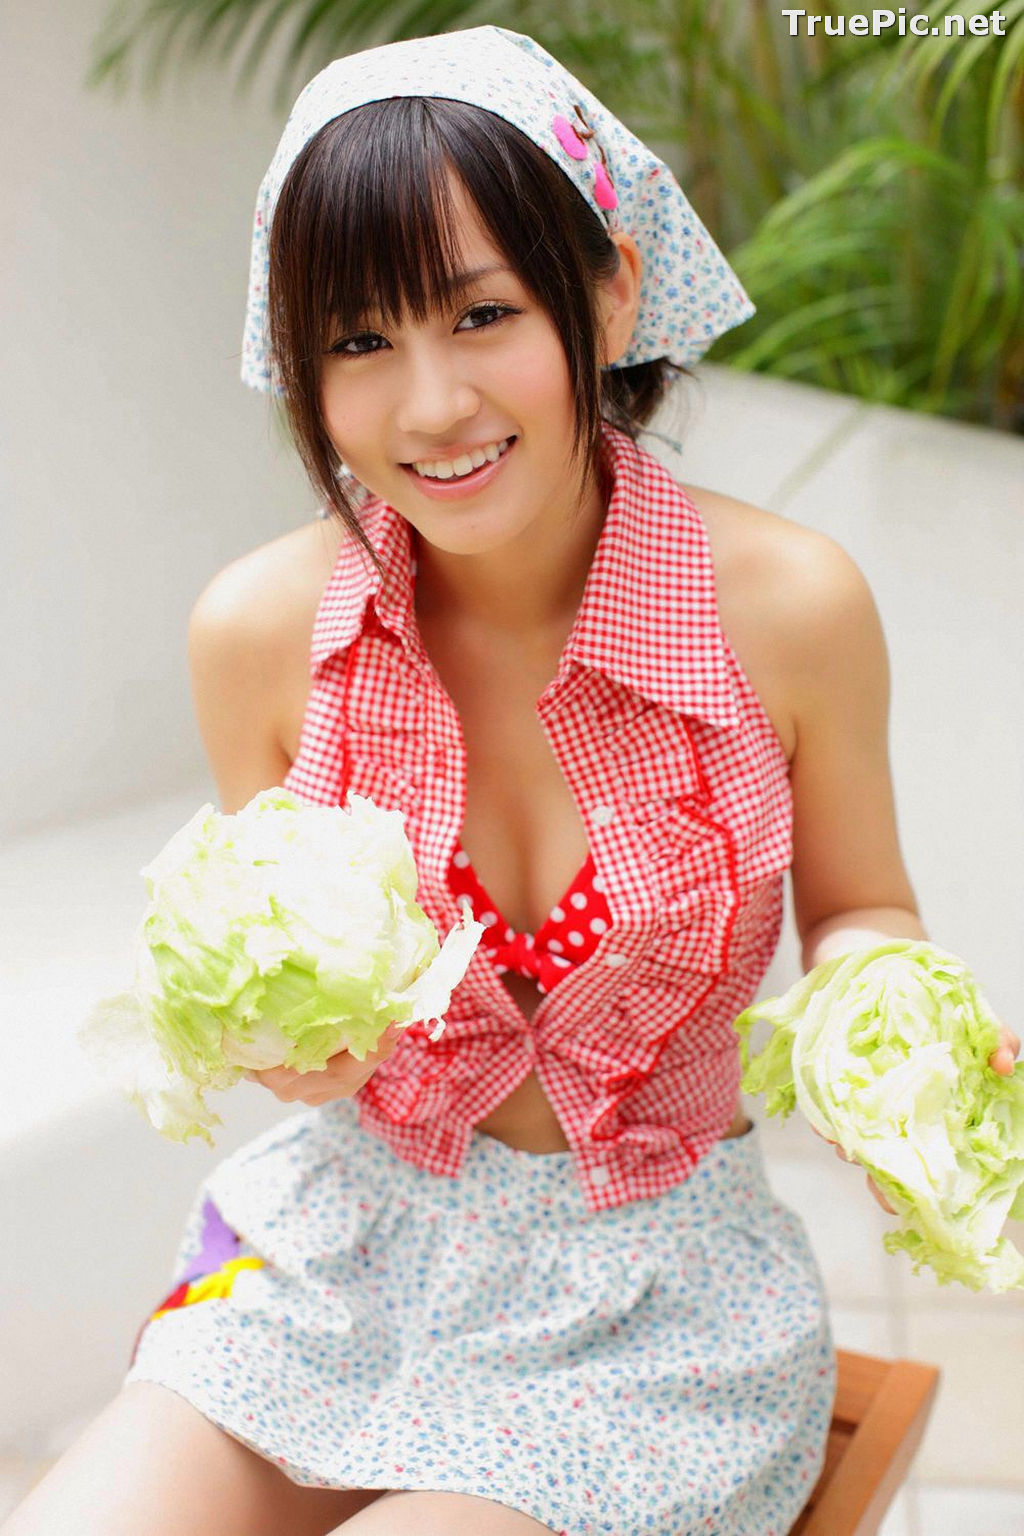 Image [YS Web] Vol.330 - Japanese Actress and Singer - Maeda Atsuko - TruePic.net - Picture-6